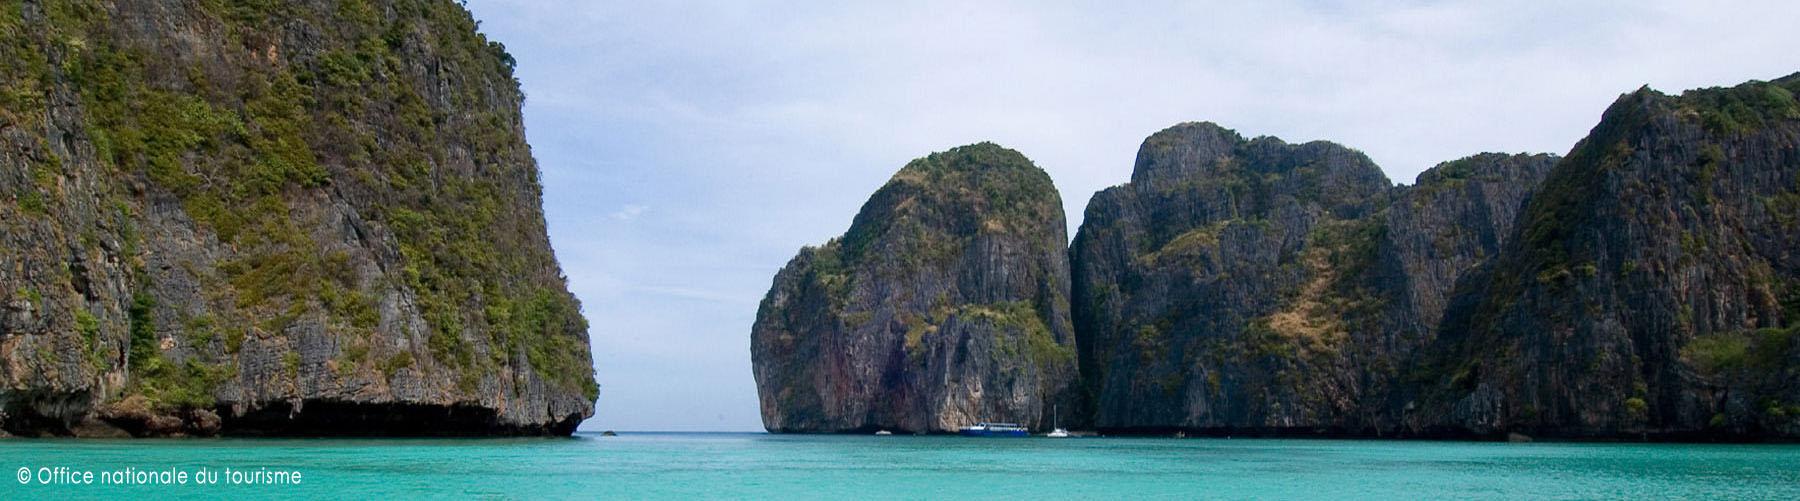 Carte Wifi Thailande.Vacances Et Croisieres Sur Mesure En Thailande